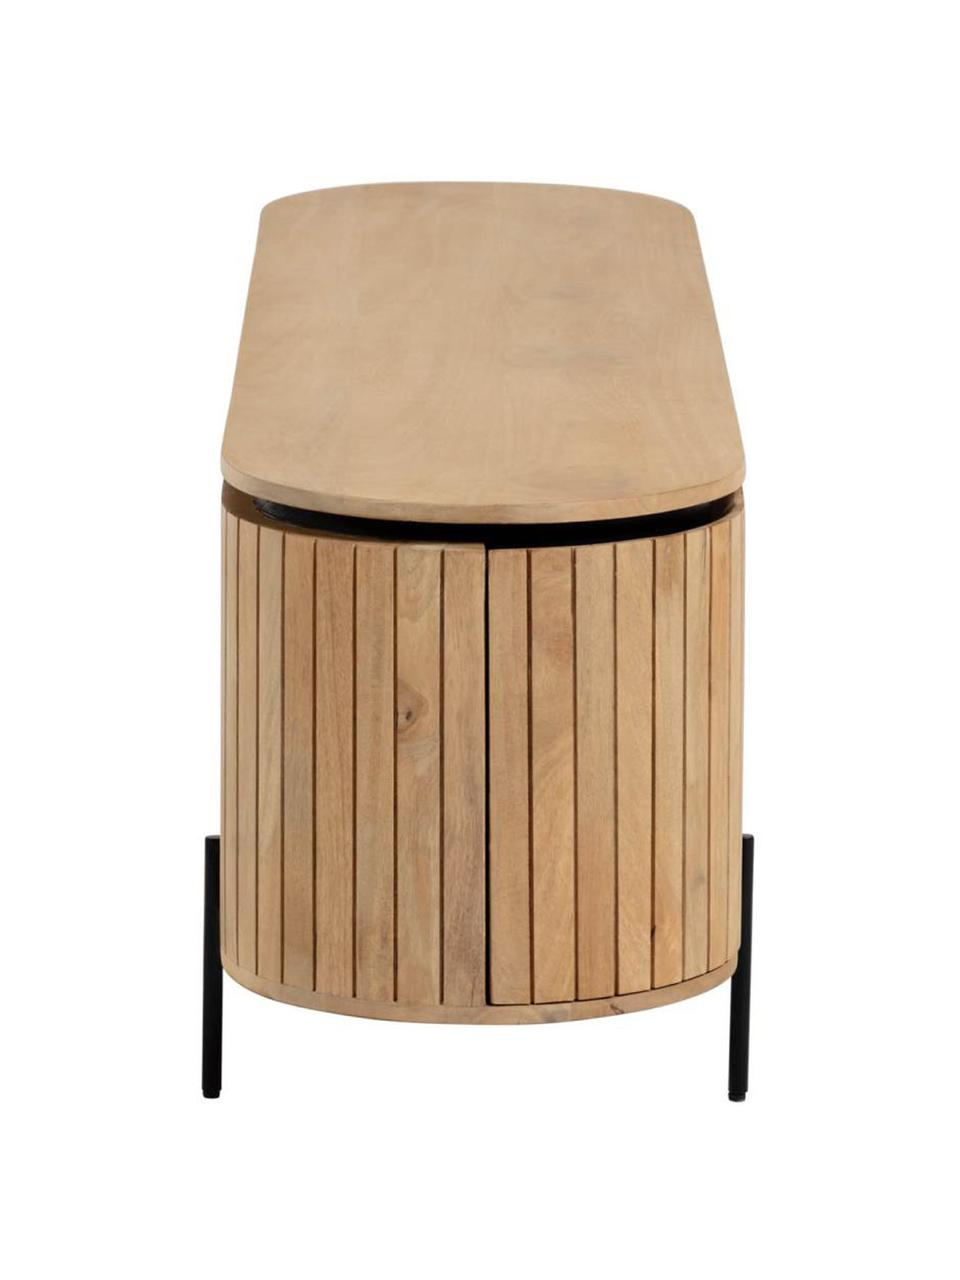 TV-Konsole Licia aus massivem Mangoholz mit Türen, Korpus: Mangoholz, per Hand polie, Füße: Metall, lackiert, Beige, Schwarz, 160 x 56 cm